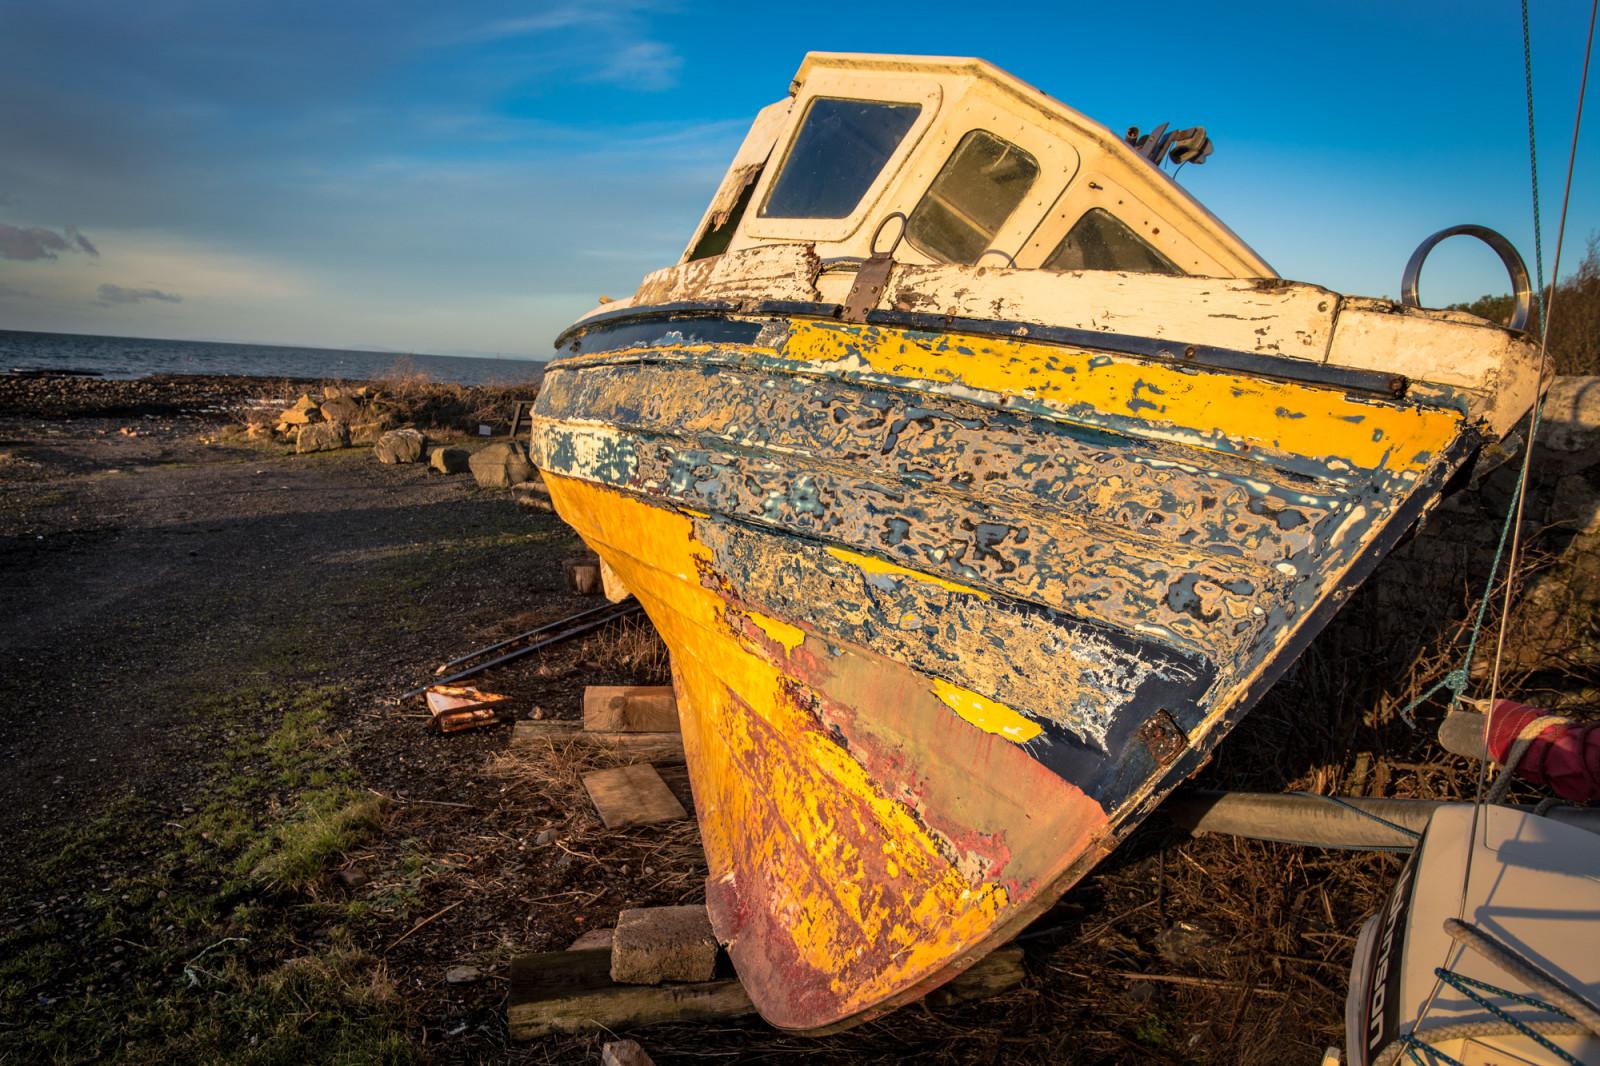 Wallpaper : boat, sunset, sea, winter, vehicle, beach ...